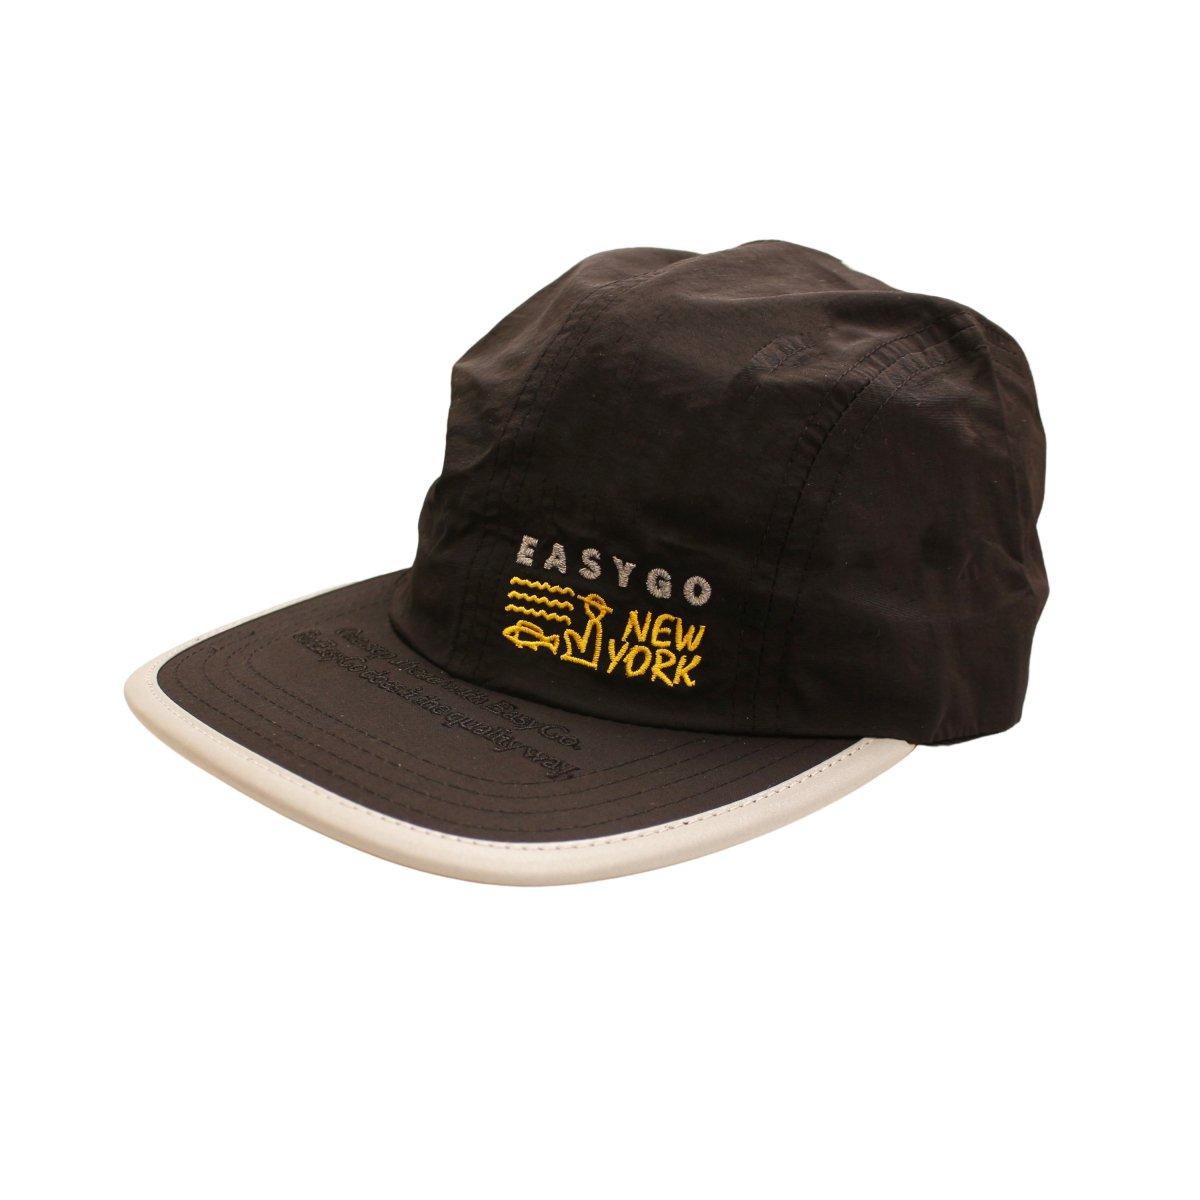 Black 6 panel hat